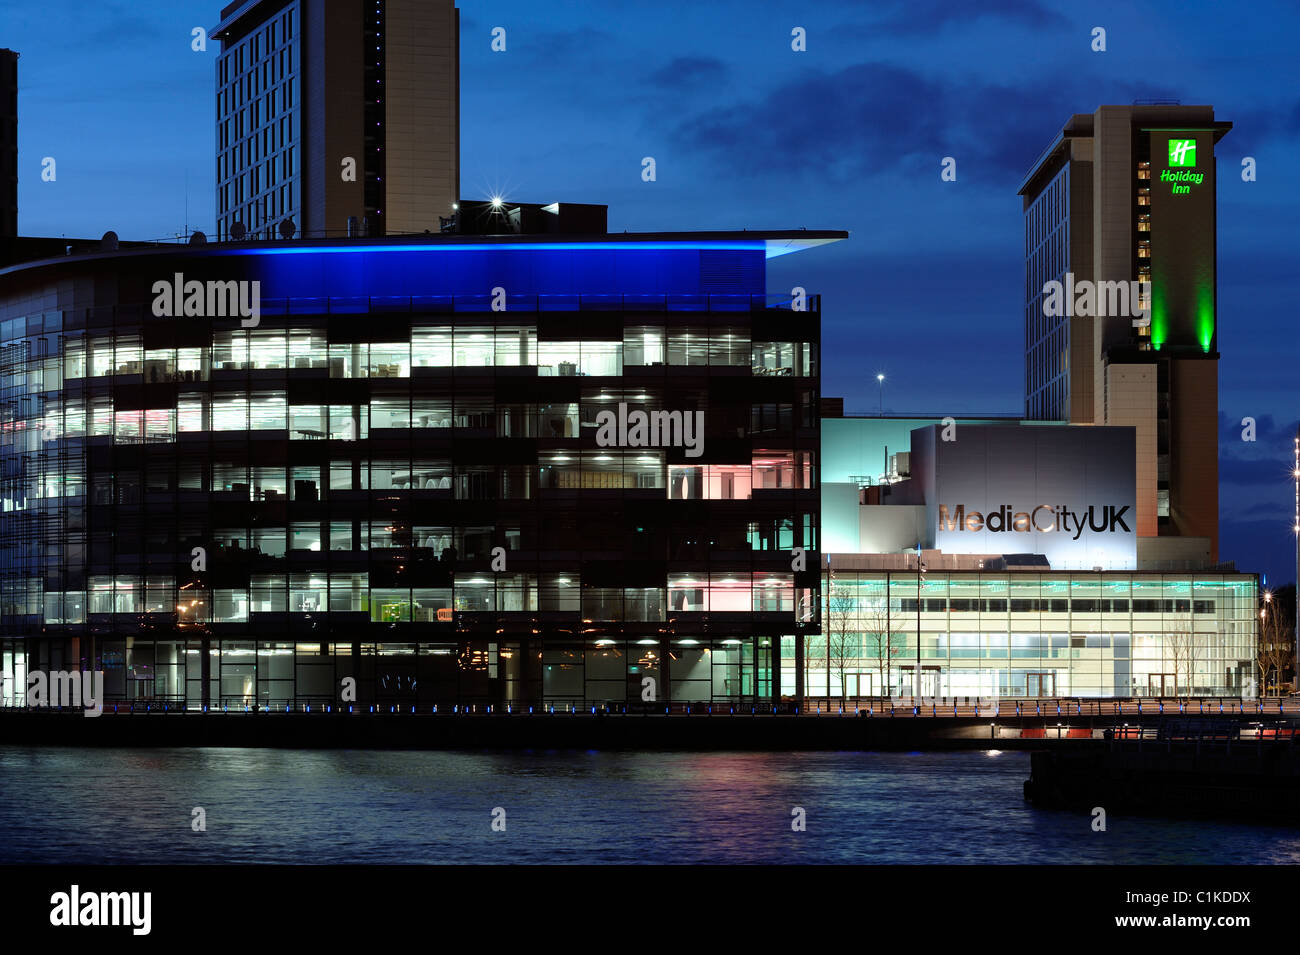 BBC Media City UK Salford Quays - Stock Image